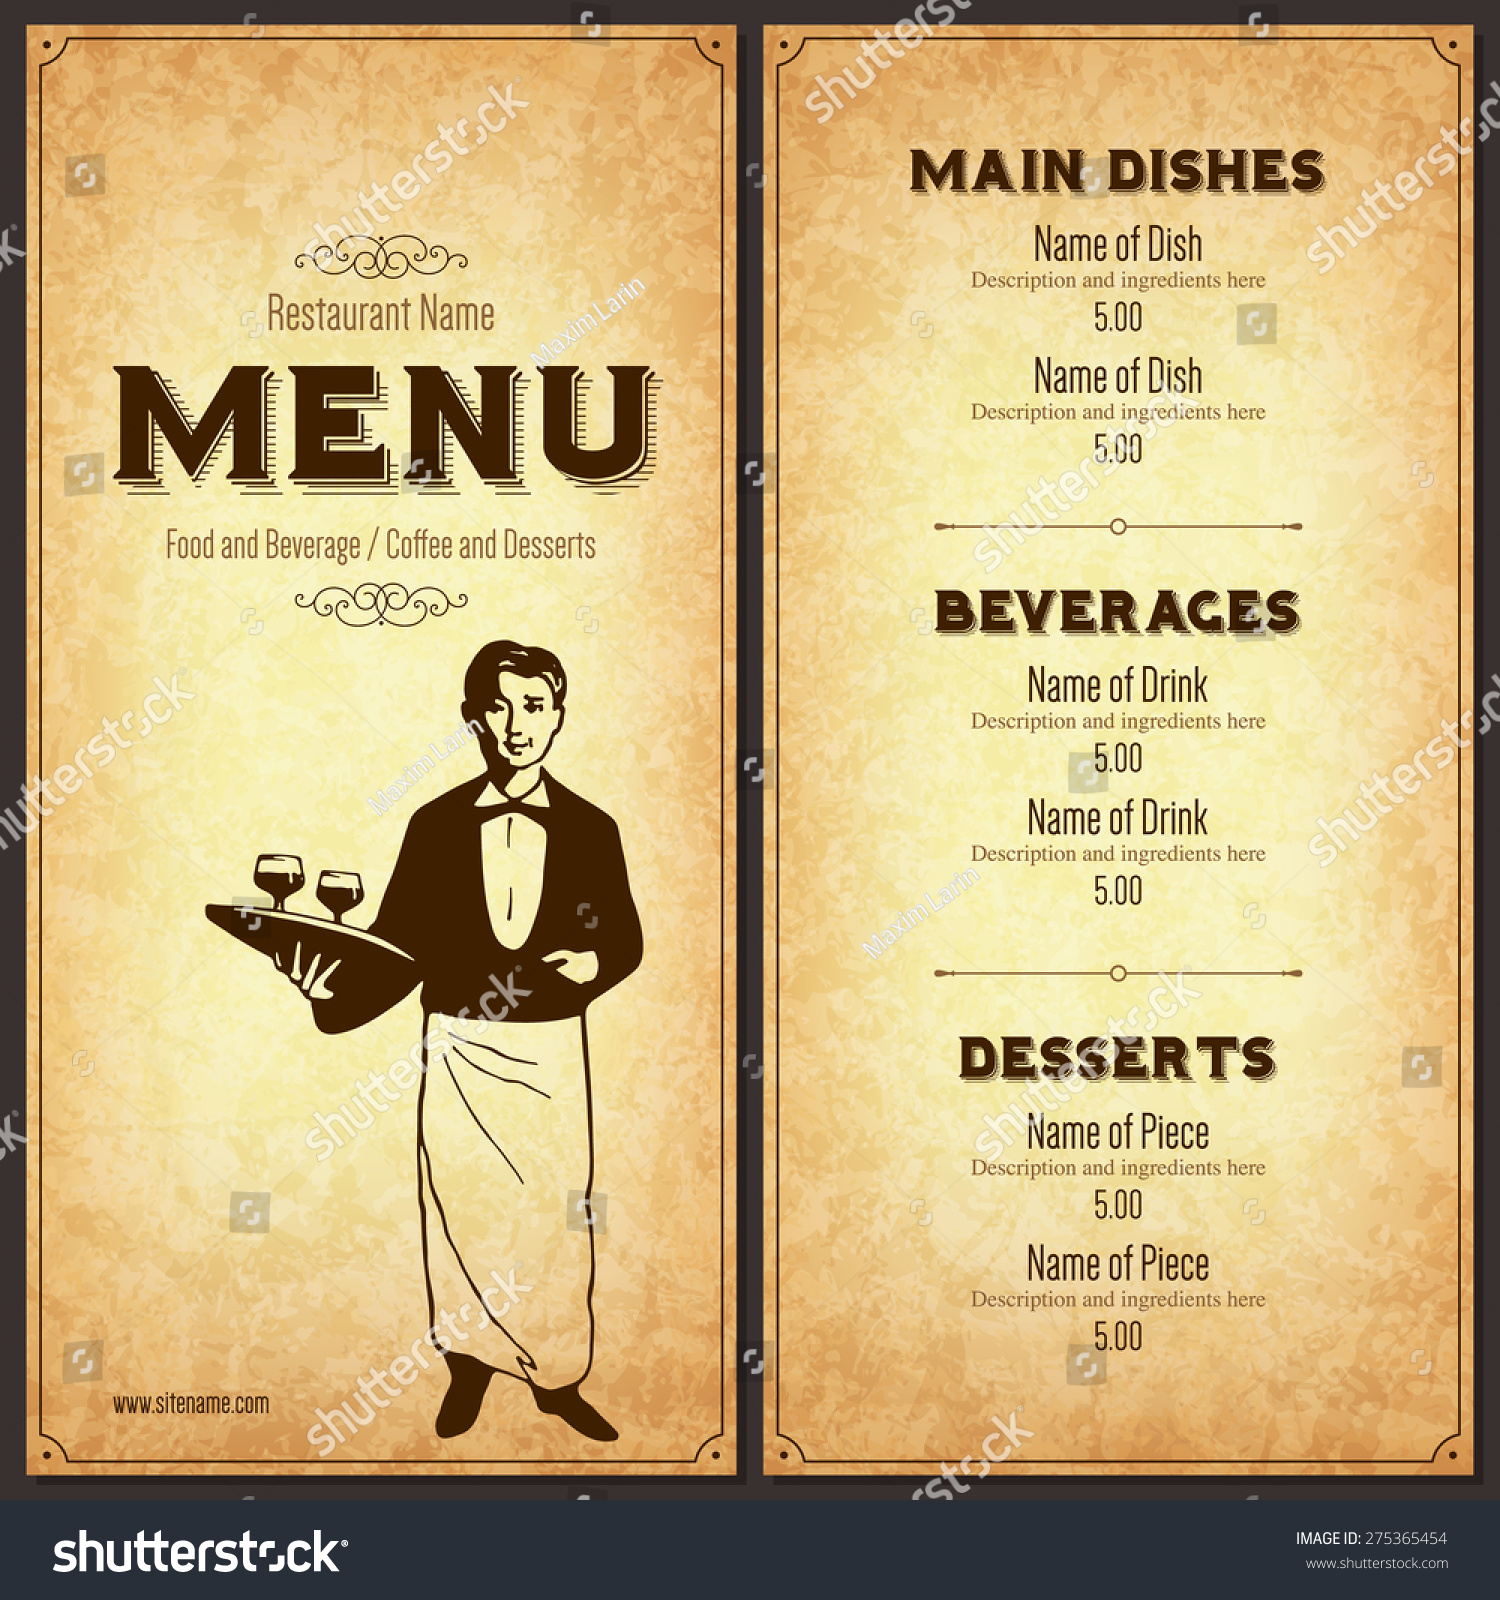 Restaurant Menu Design Vector : Restaurant menu design vector brochure template for